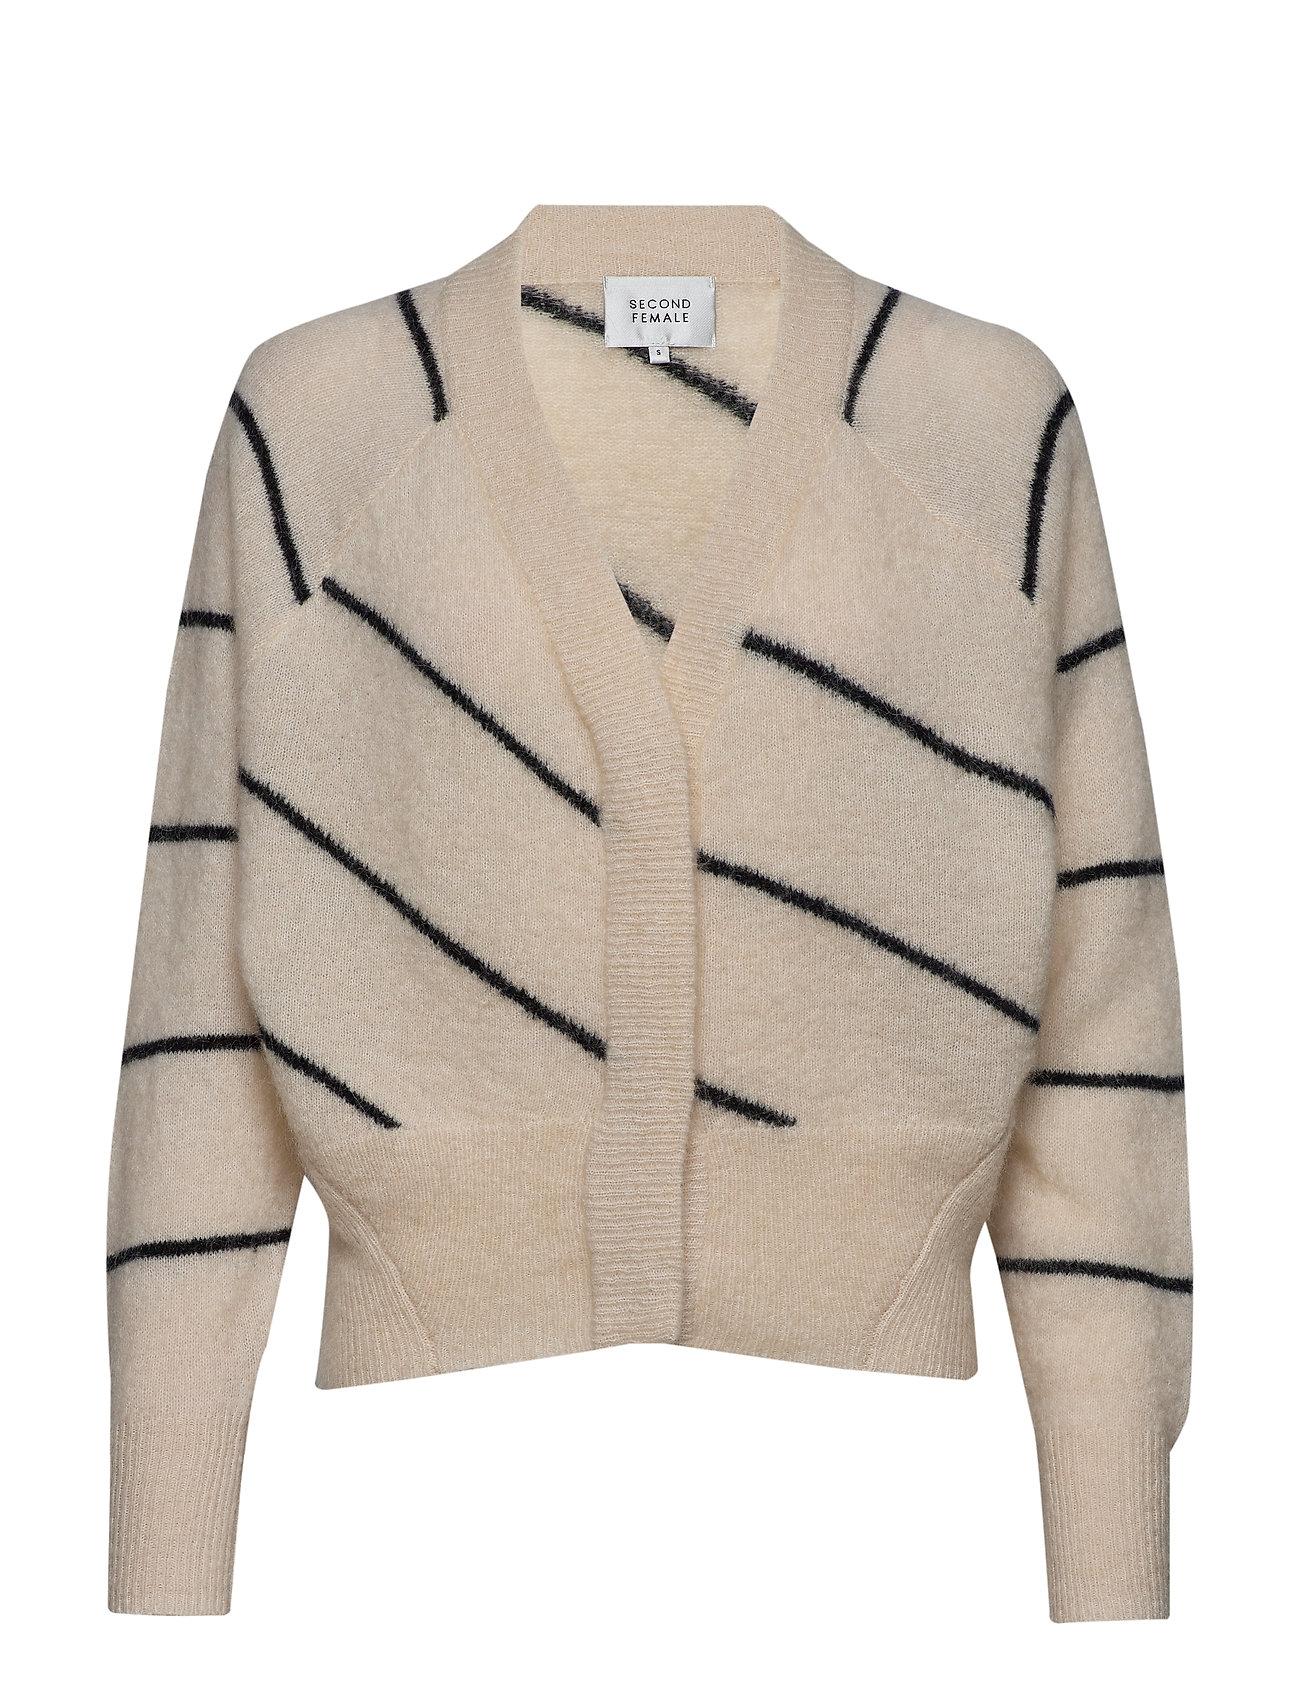 Second Female Brook Knit Striped Boxy Cardigan - EGGNOG